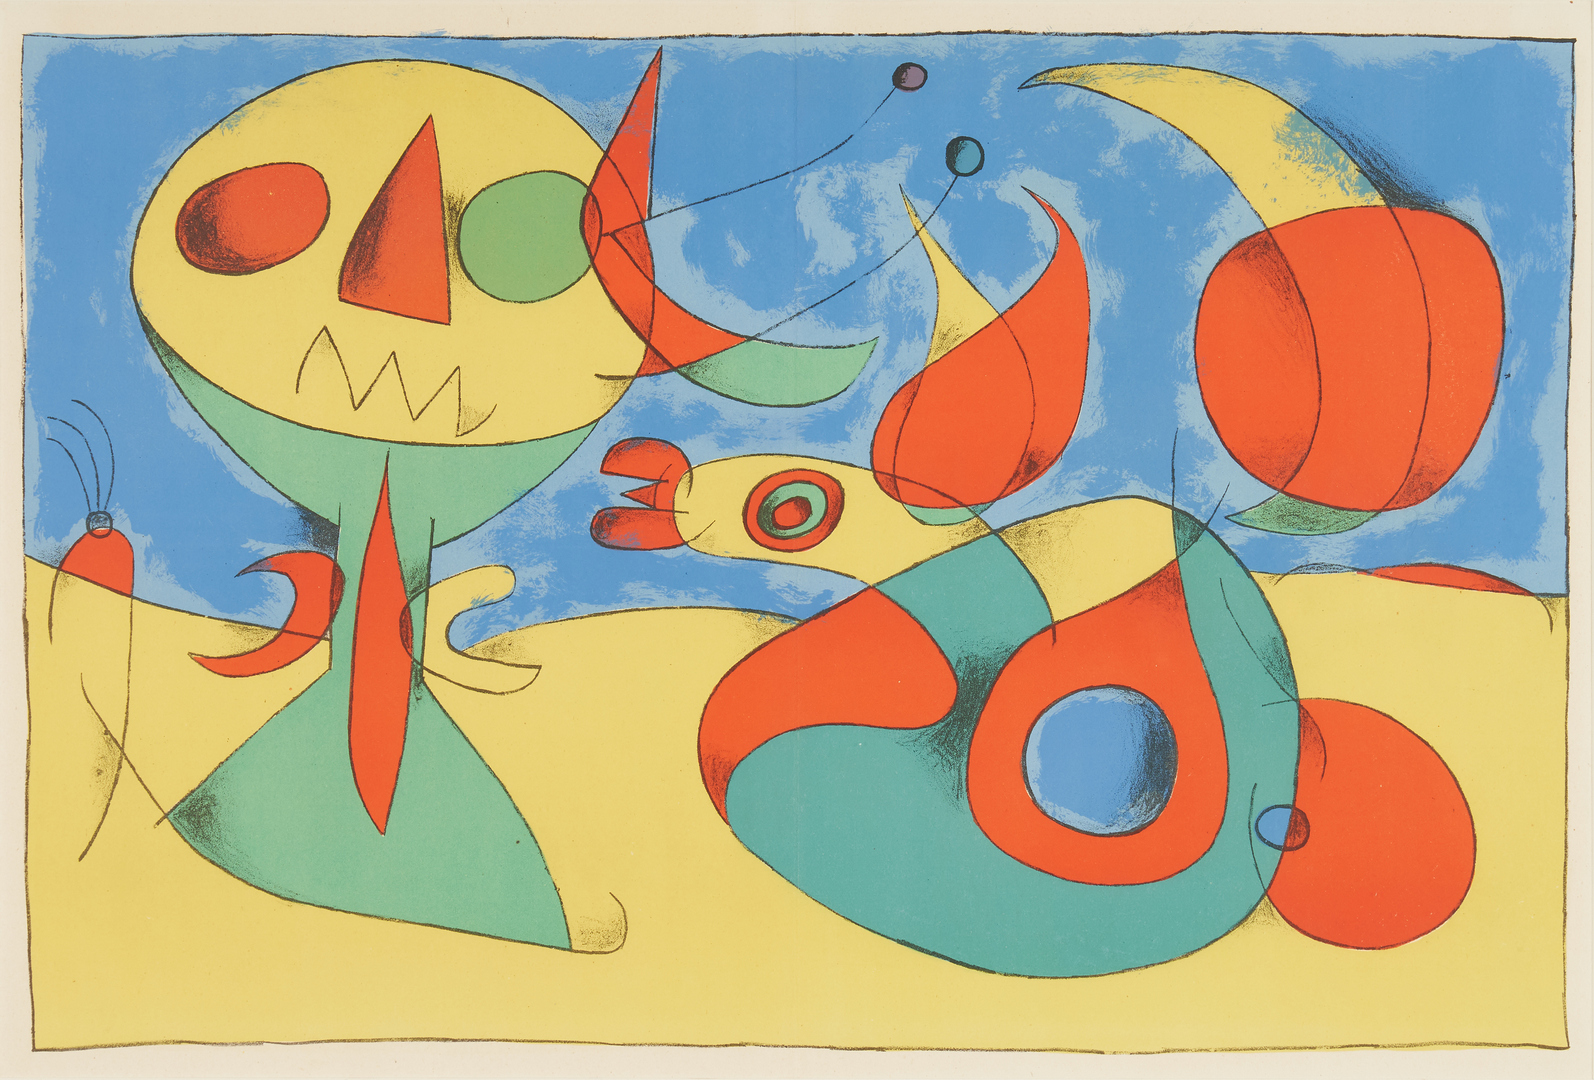 Lot 564: Joan Miro Lithograph, Zephir Vogel